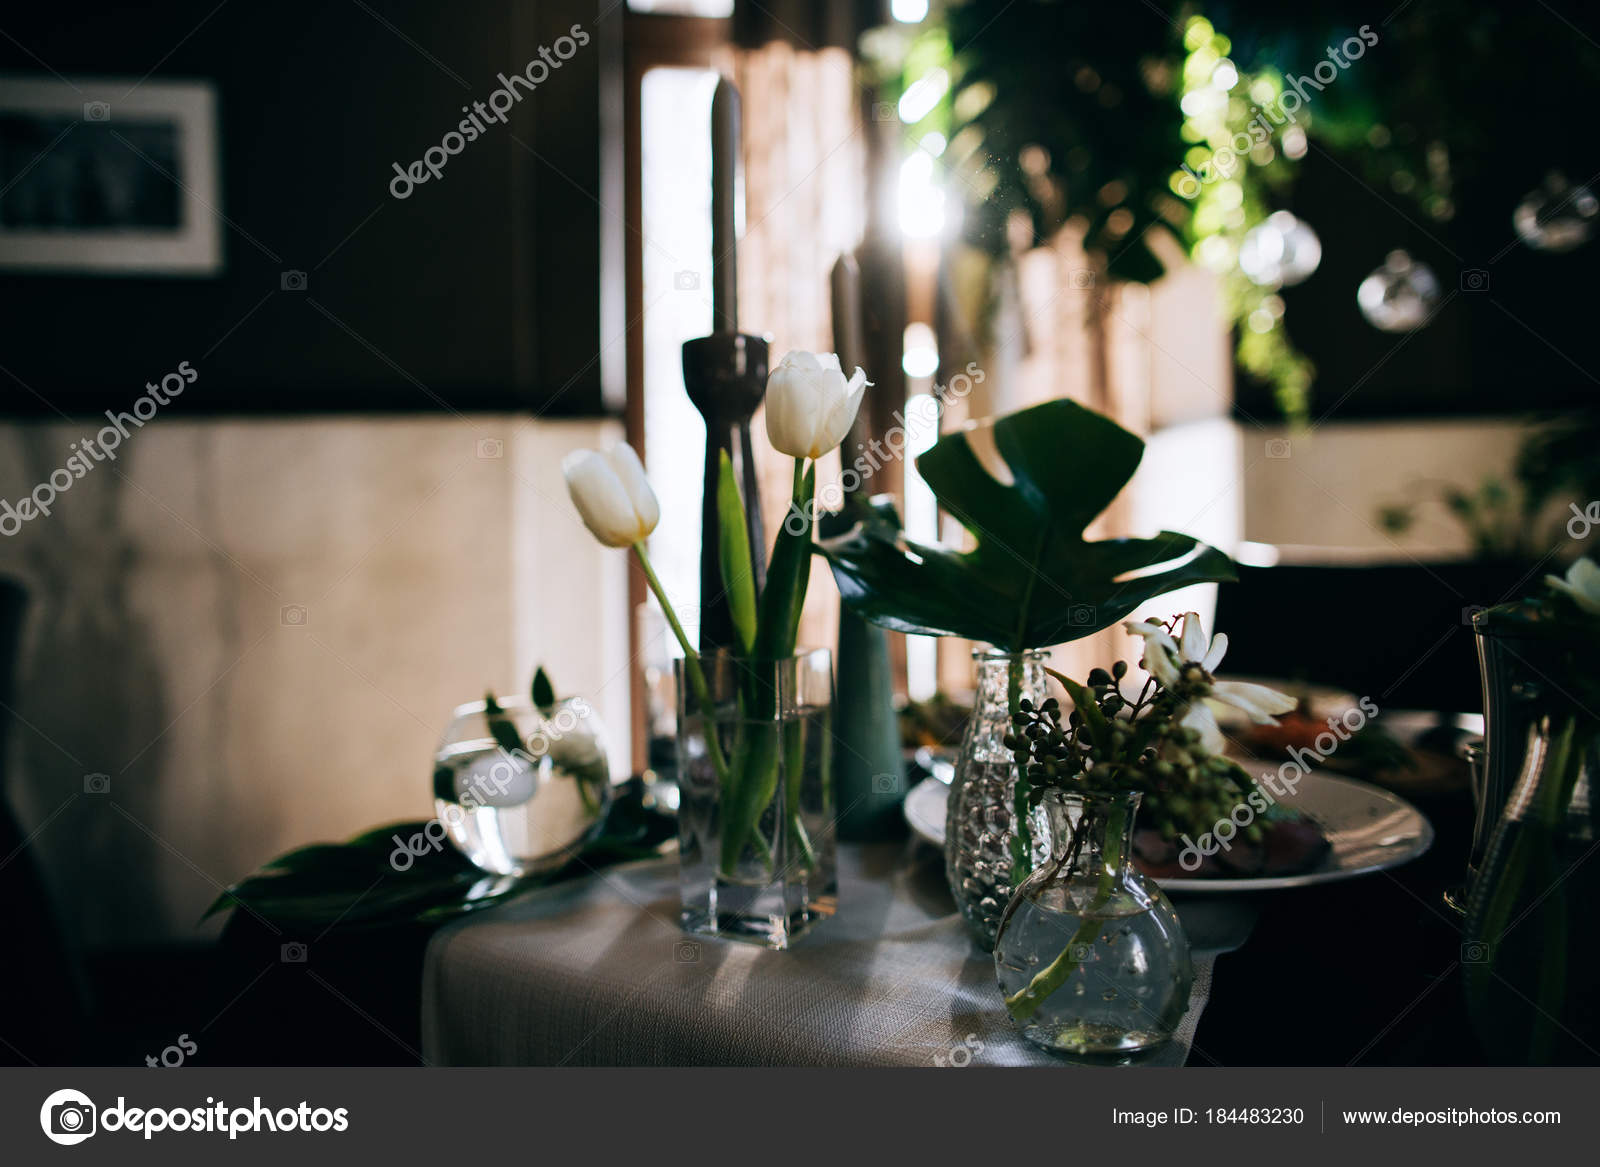 Vyzdoba Restauraci Pro Svatebni Hostiny Stock Fotografie C Beorm